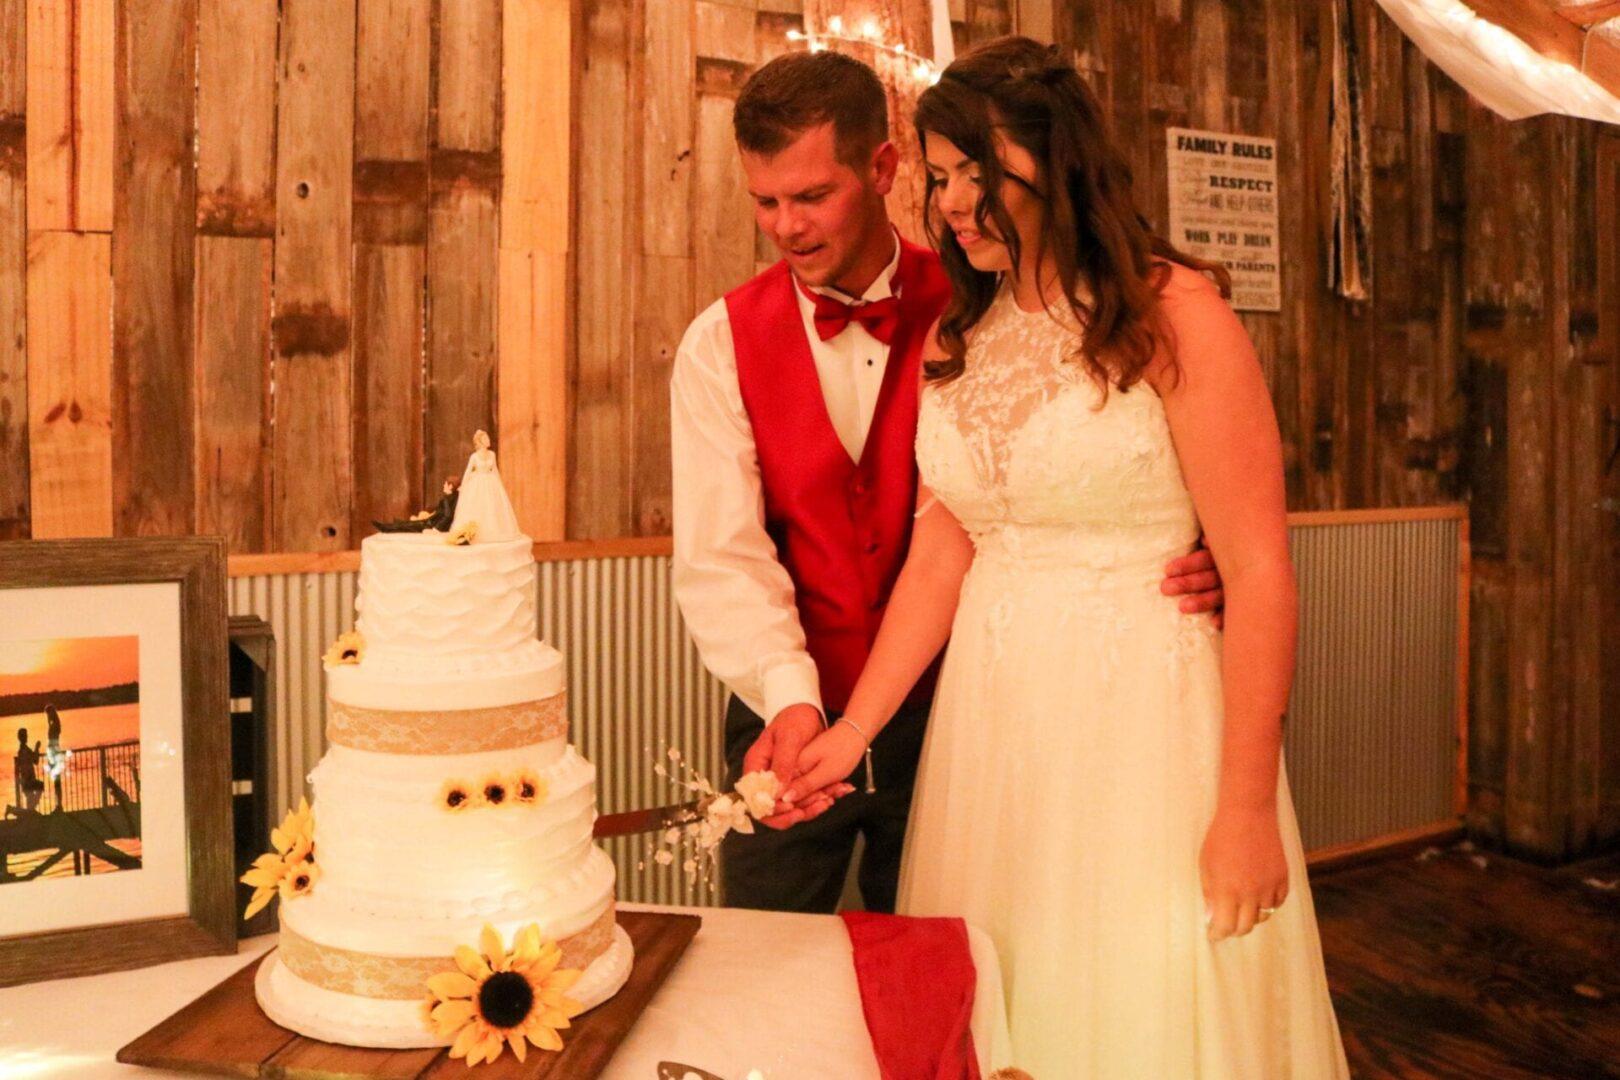 Wedding couple cutting their cake